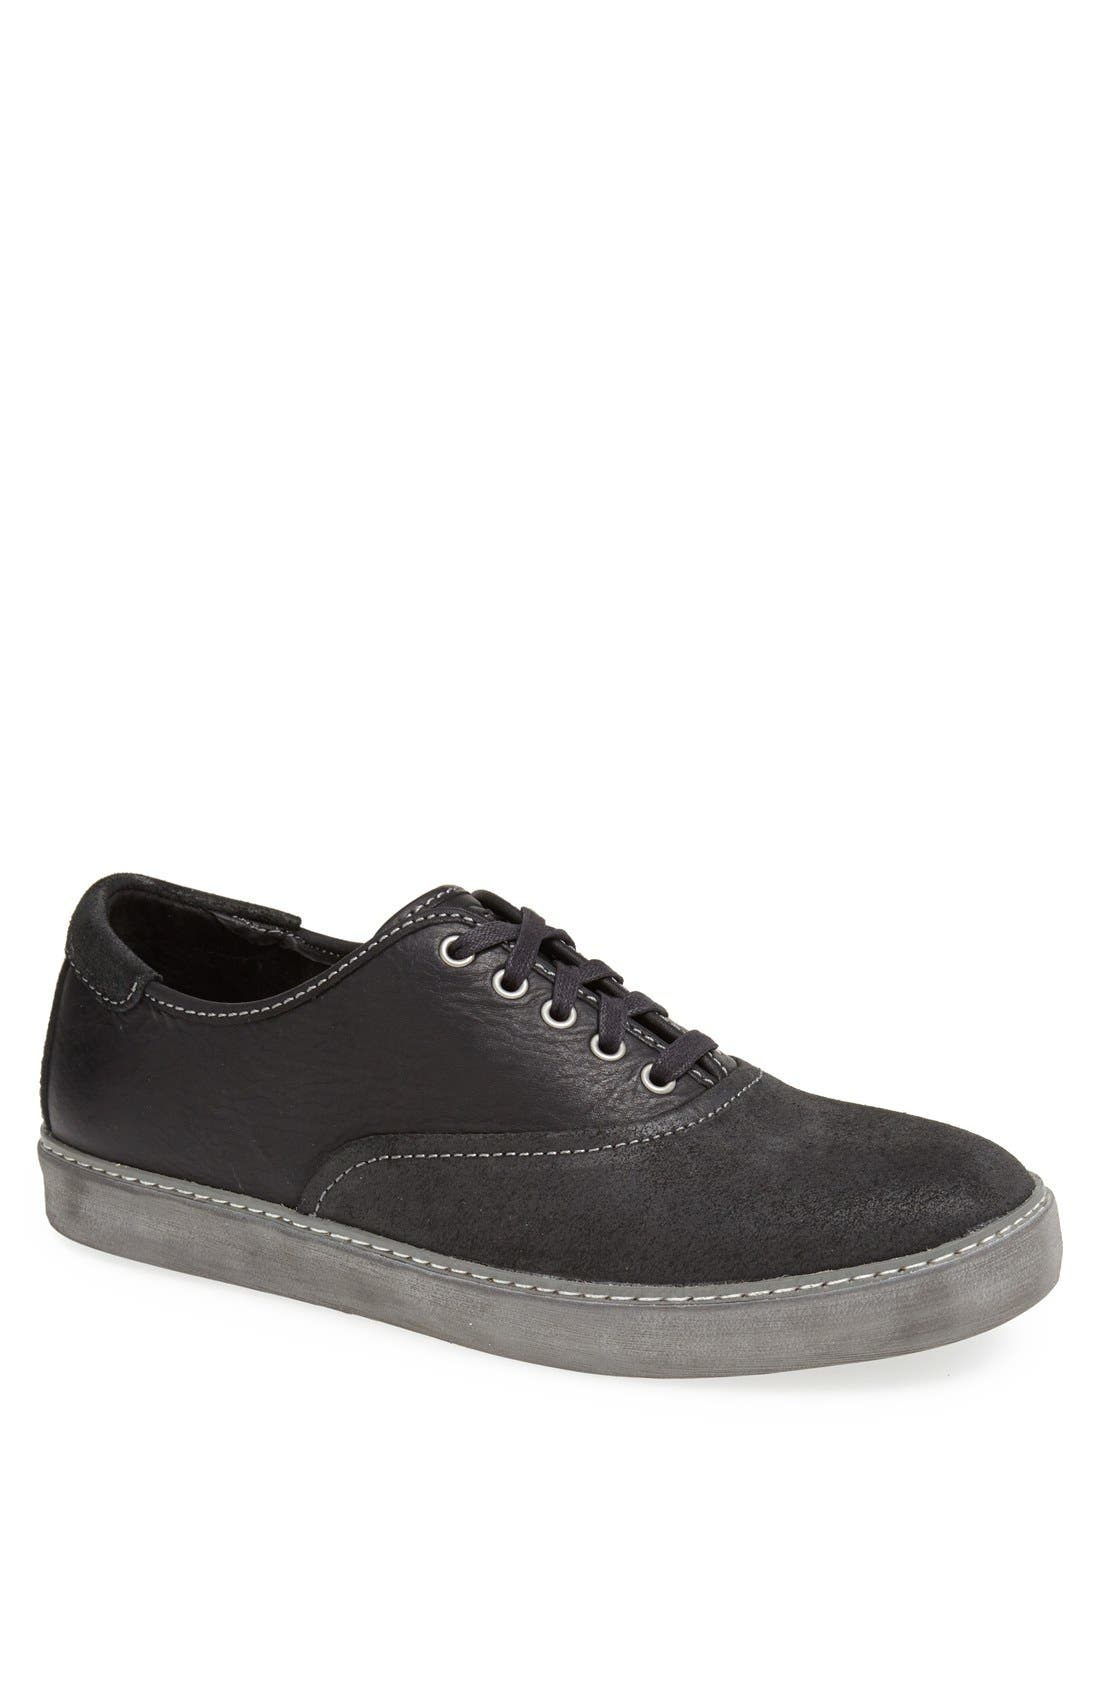 Main Image - UGG® Australia 'Garrick' Oxford Sneaker